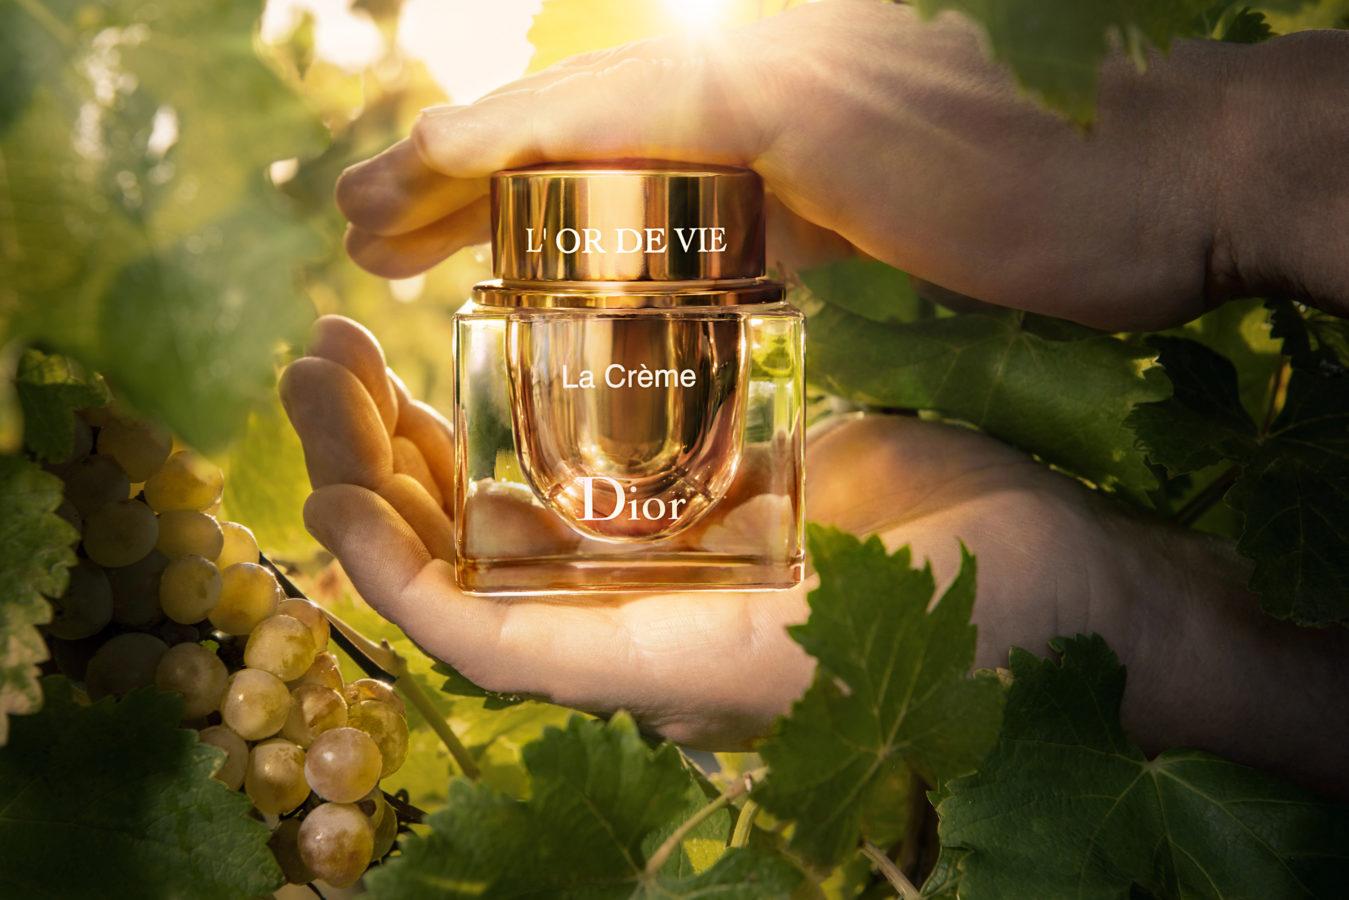 Dior Further Elevates Its Revolutionary Anti-aging Formula L'Or de Vie